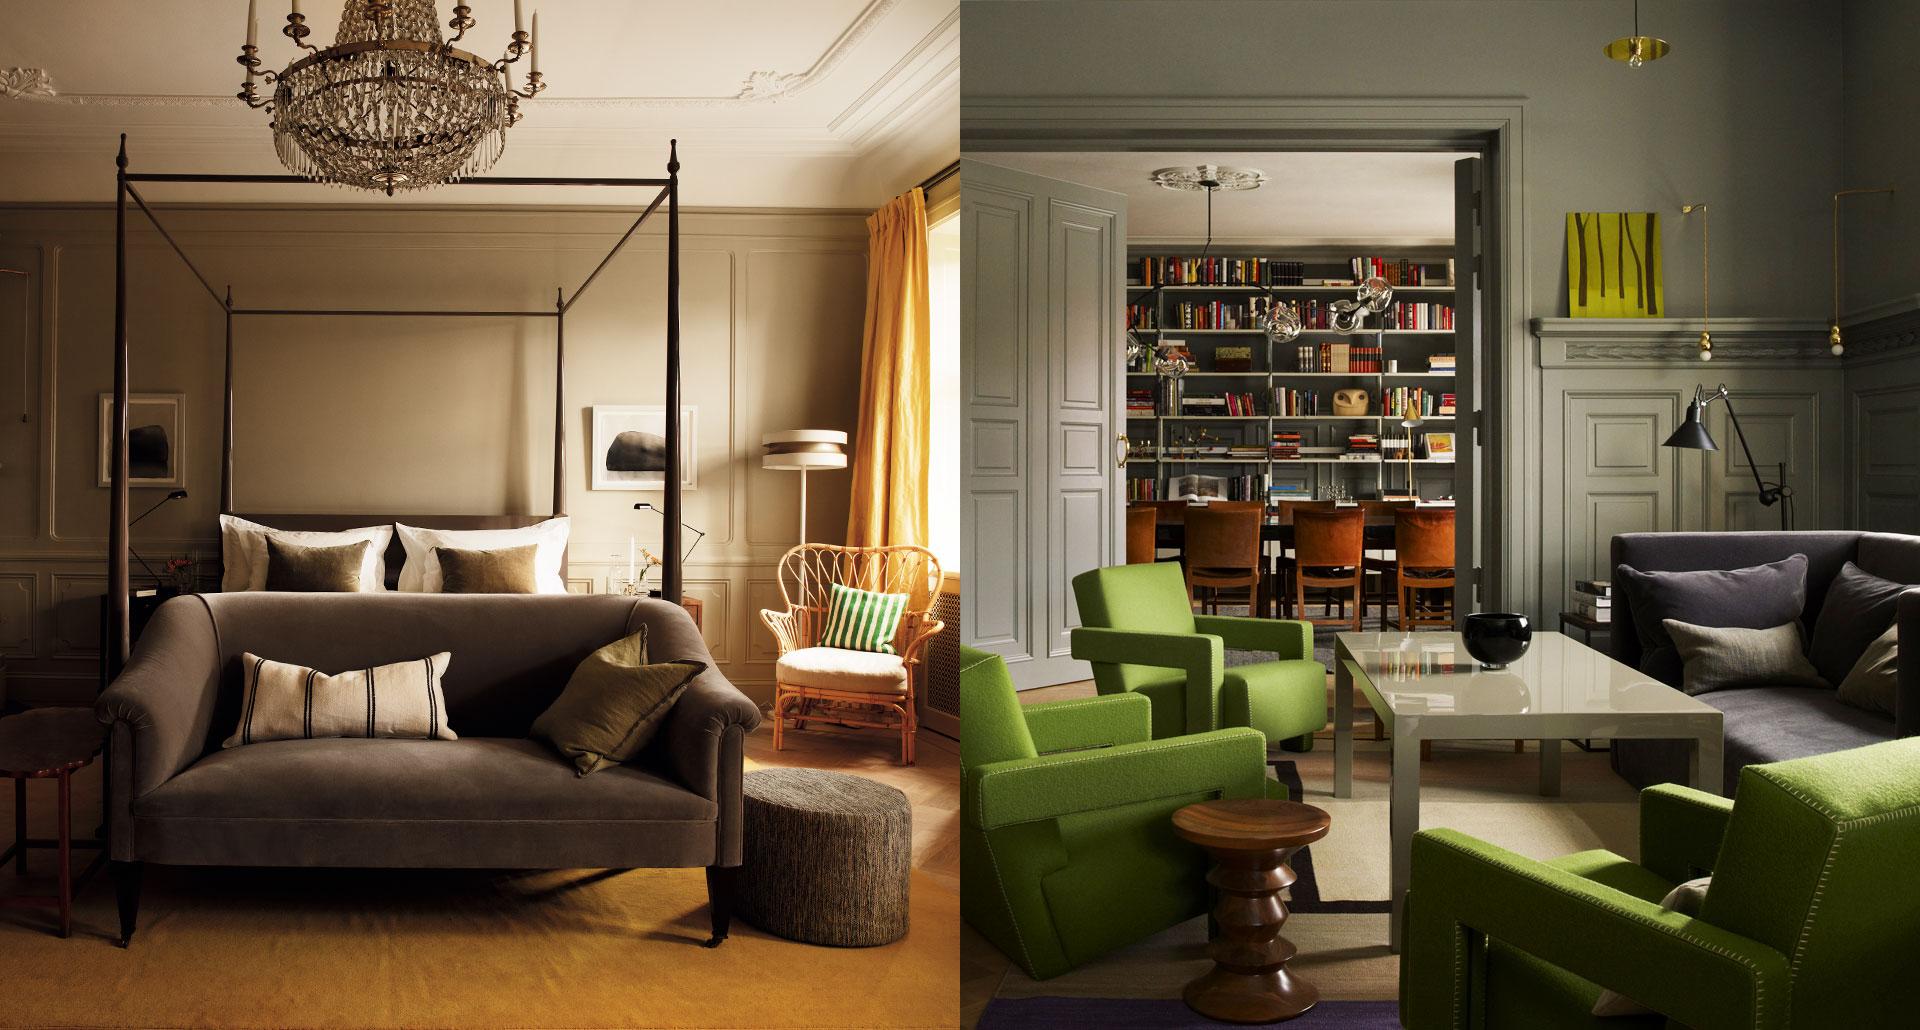 Ett Hem boutique hotel in Stockholm, Sweden